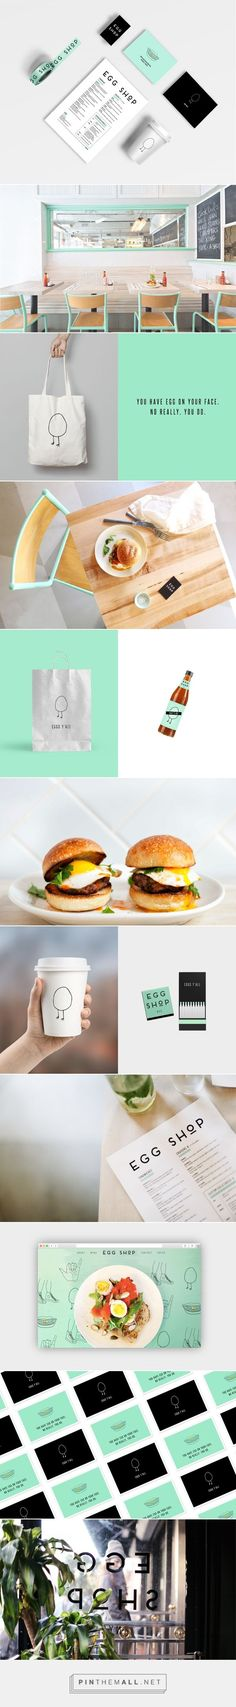 Egg Shop Nyc Restaurant Branding by Katie Minchak | Fivestar Branding Agency – Design and Branding Agency & Curated Inspiration Gallery